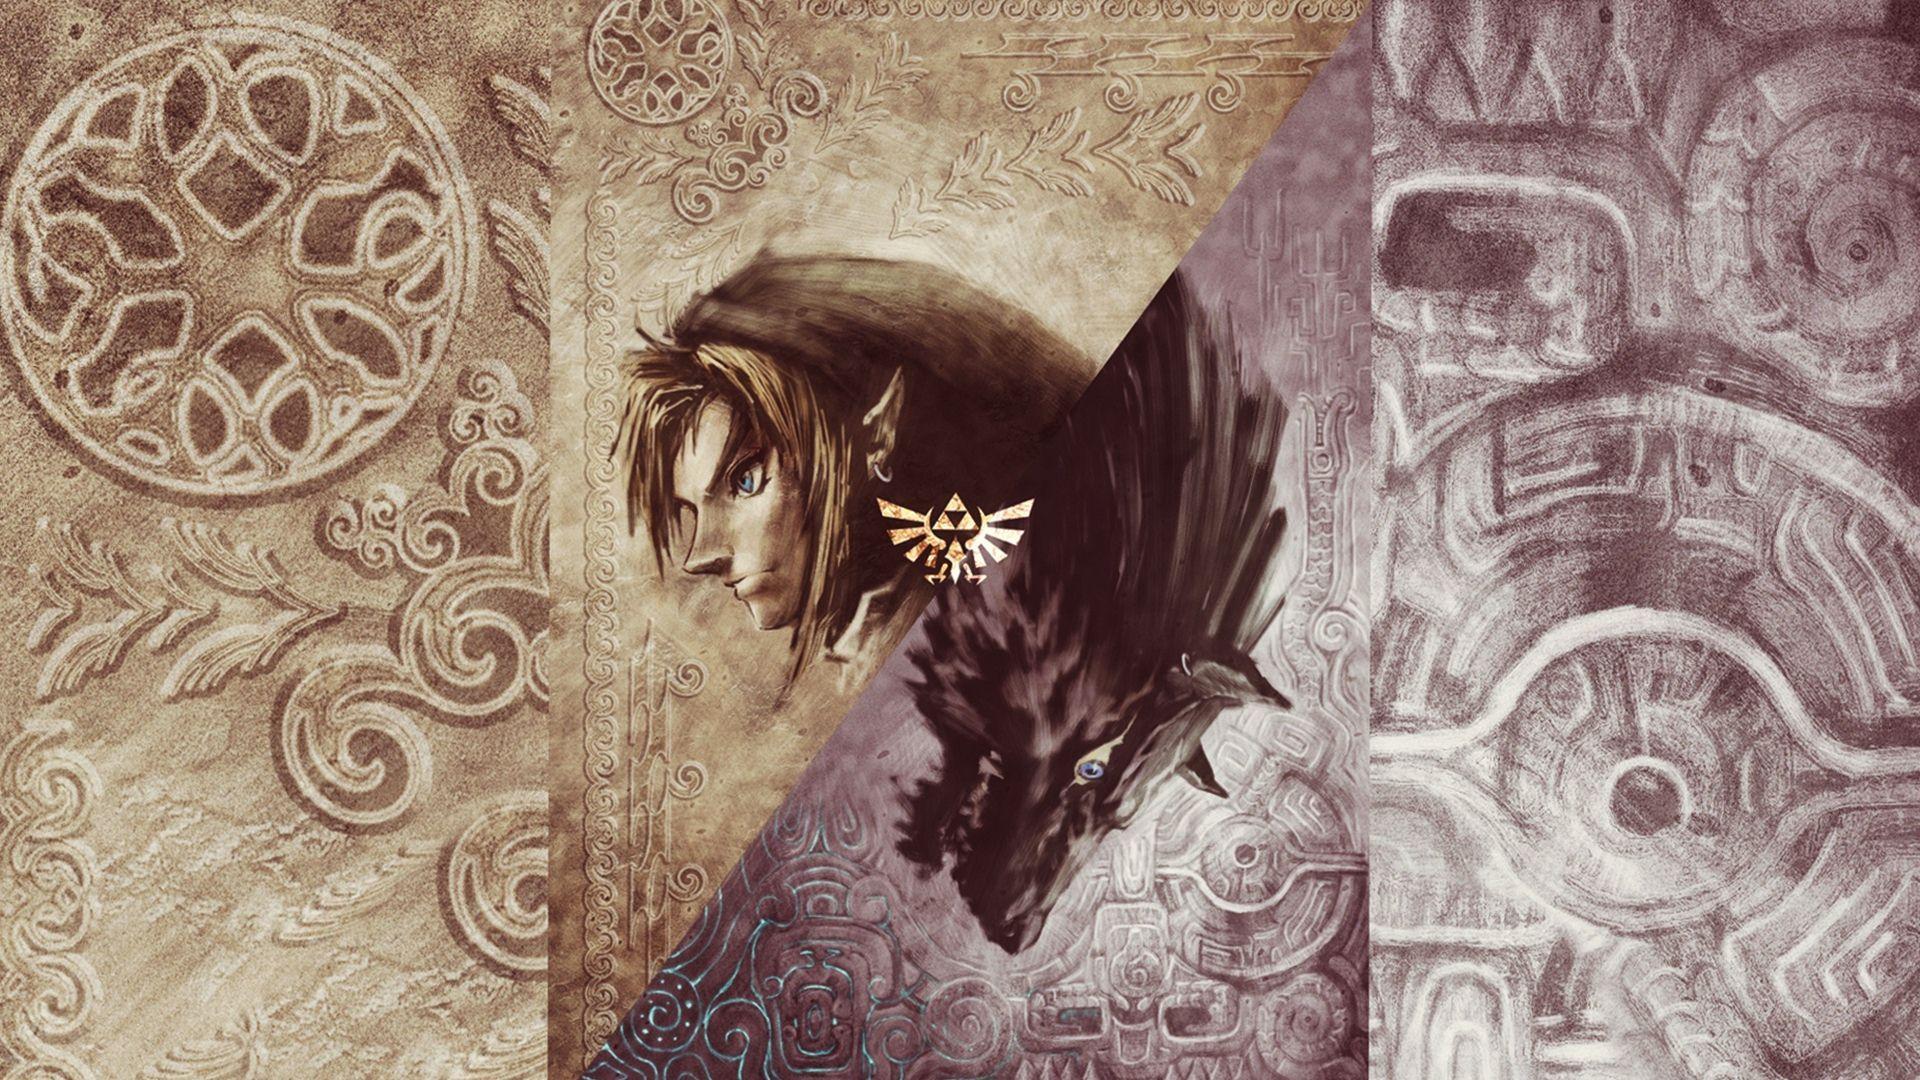 Hd The Legend Of Zelda Twilight Princess Wallpaper Tloz Tp